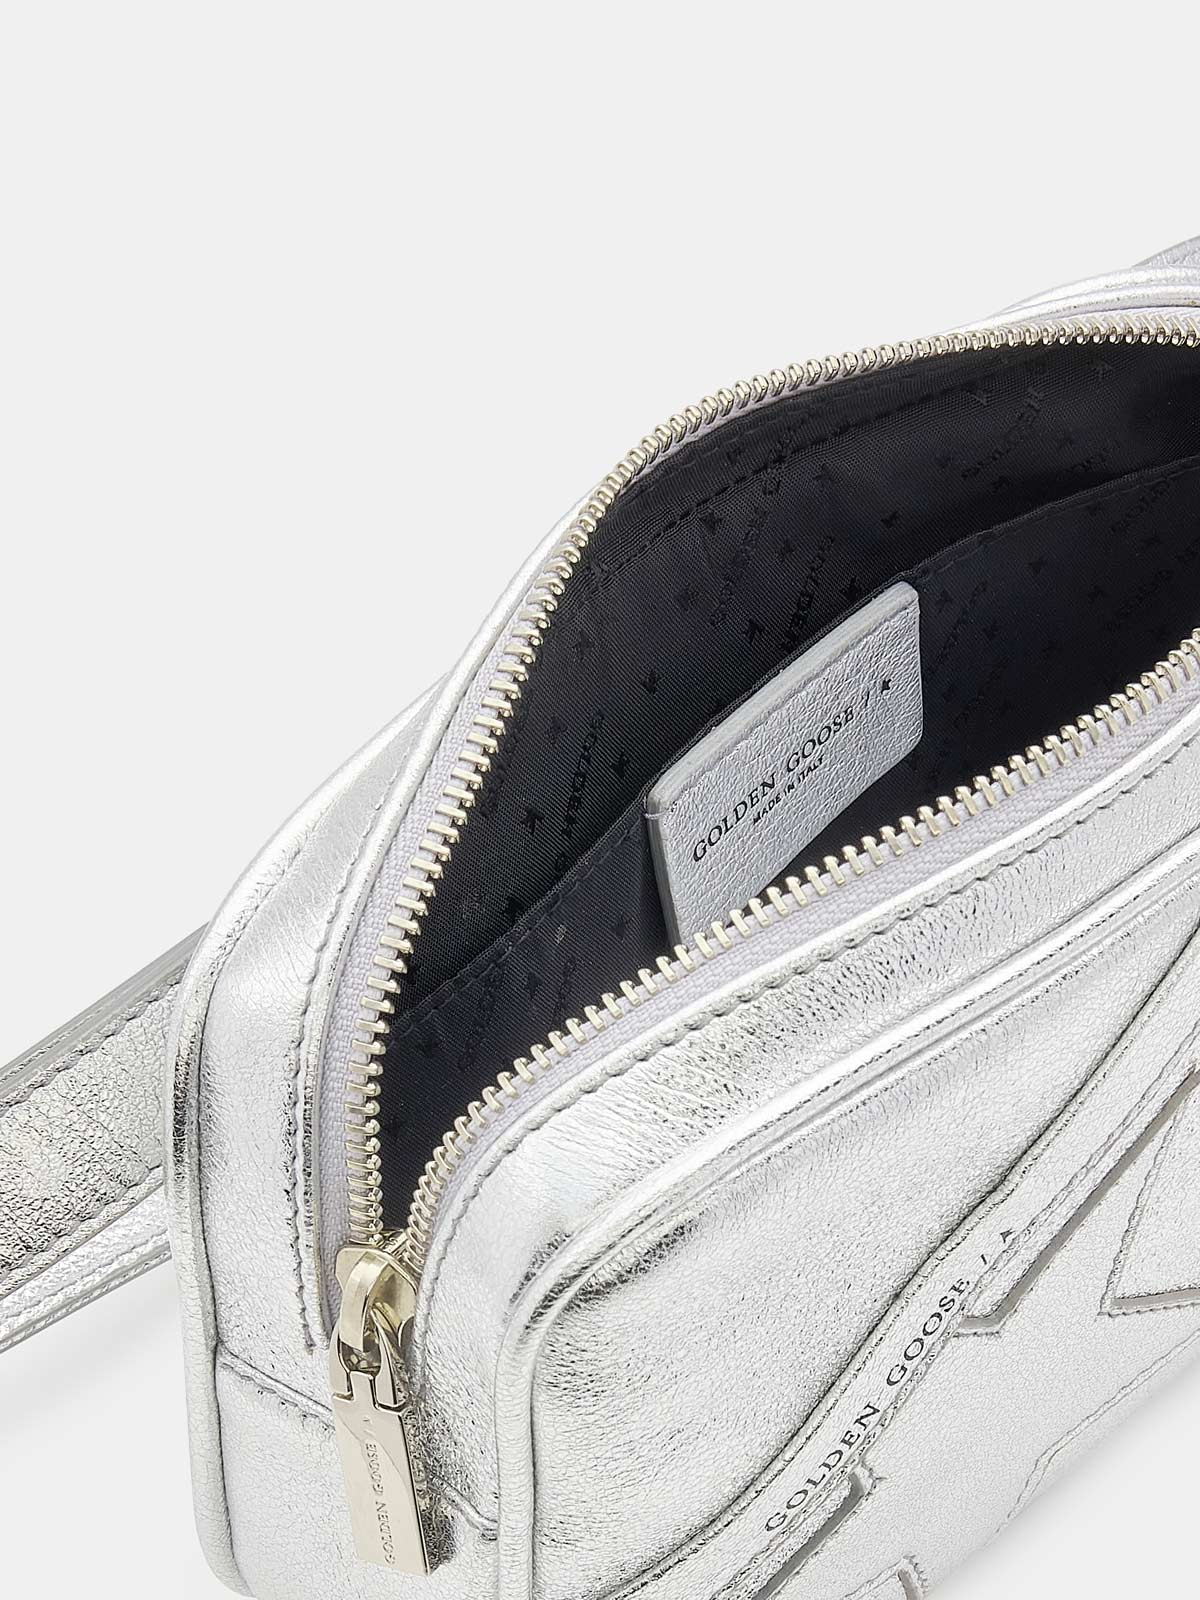 Golden Goose - Star Belt Bag made of silver laminated leather in